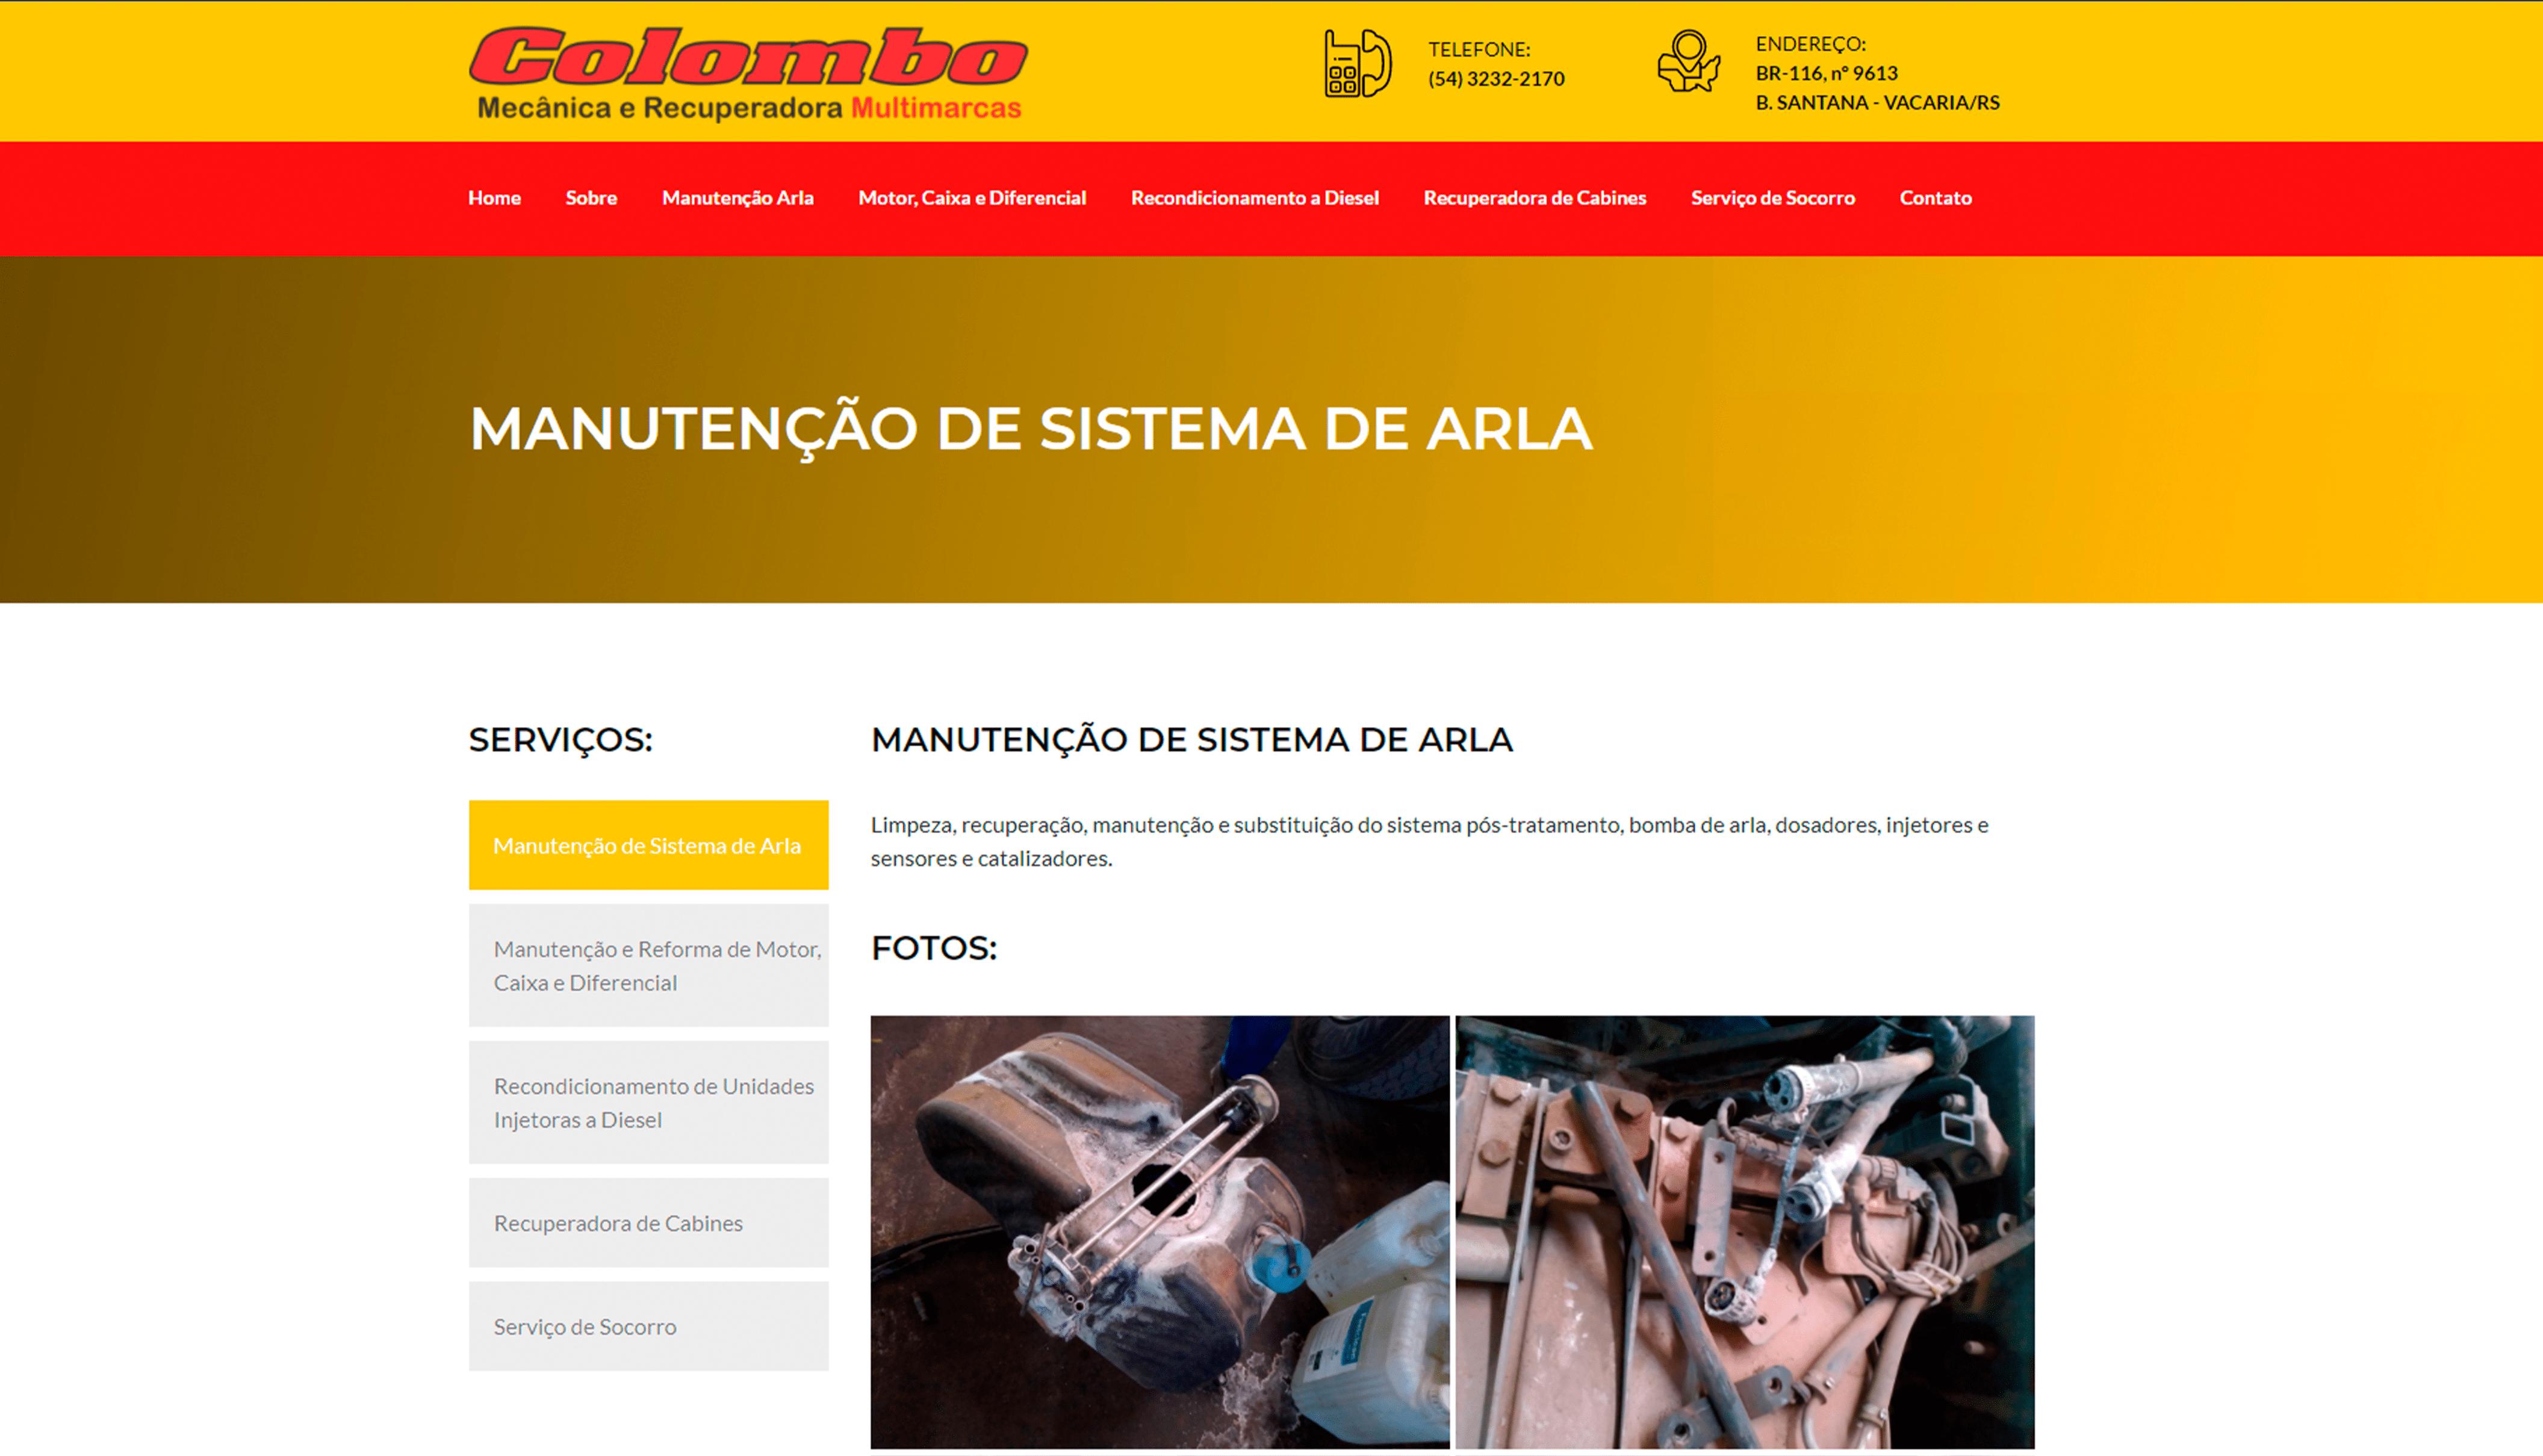 https://www.6i.com.br/case/colombo-pecas/